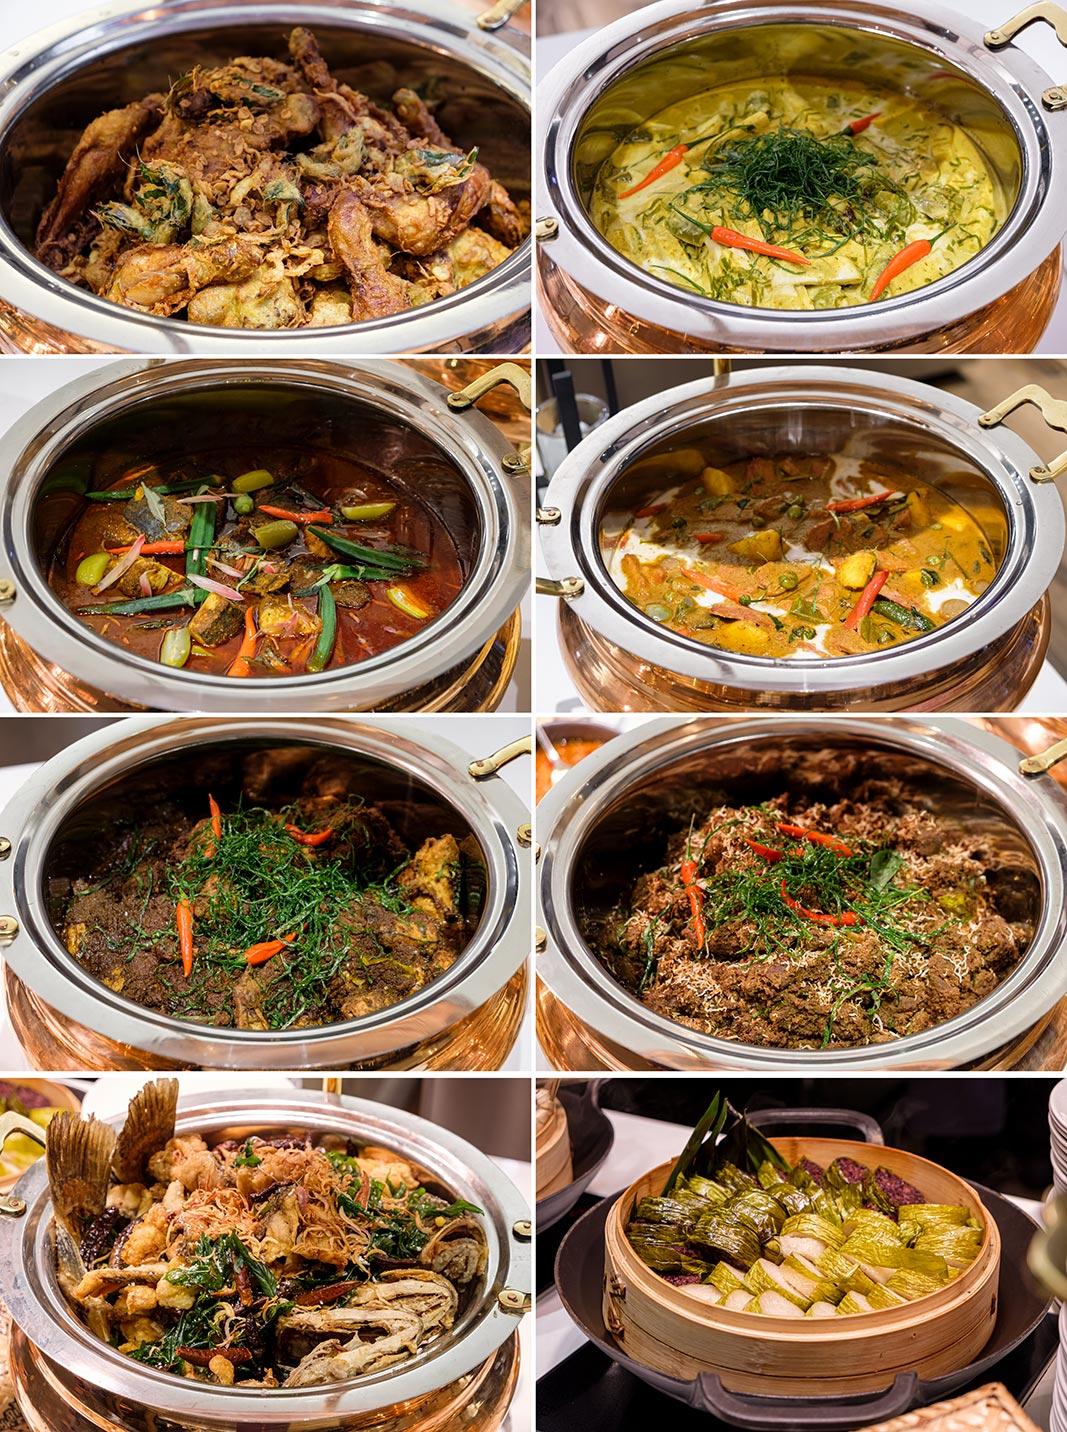 eq-hot-food2